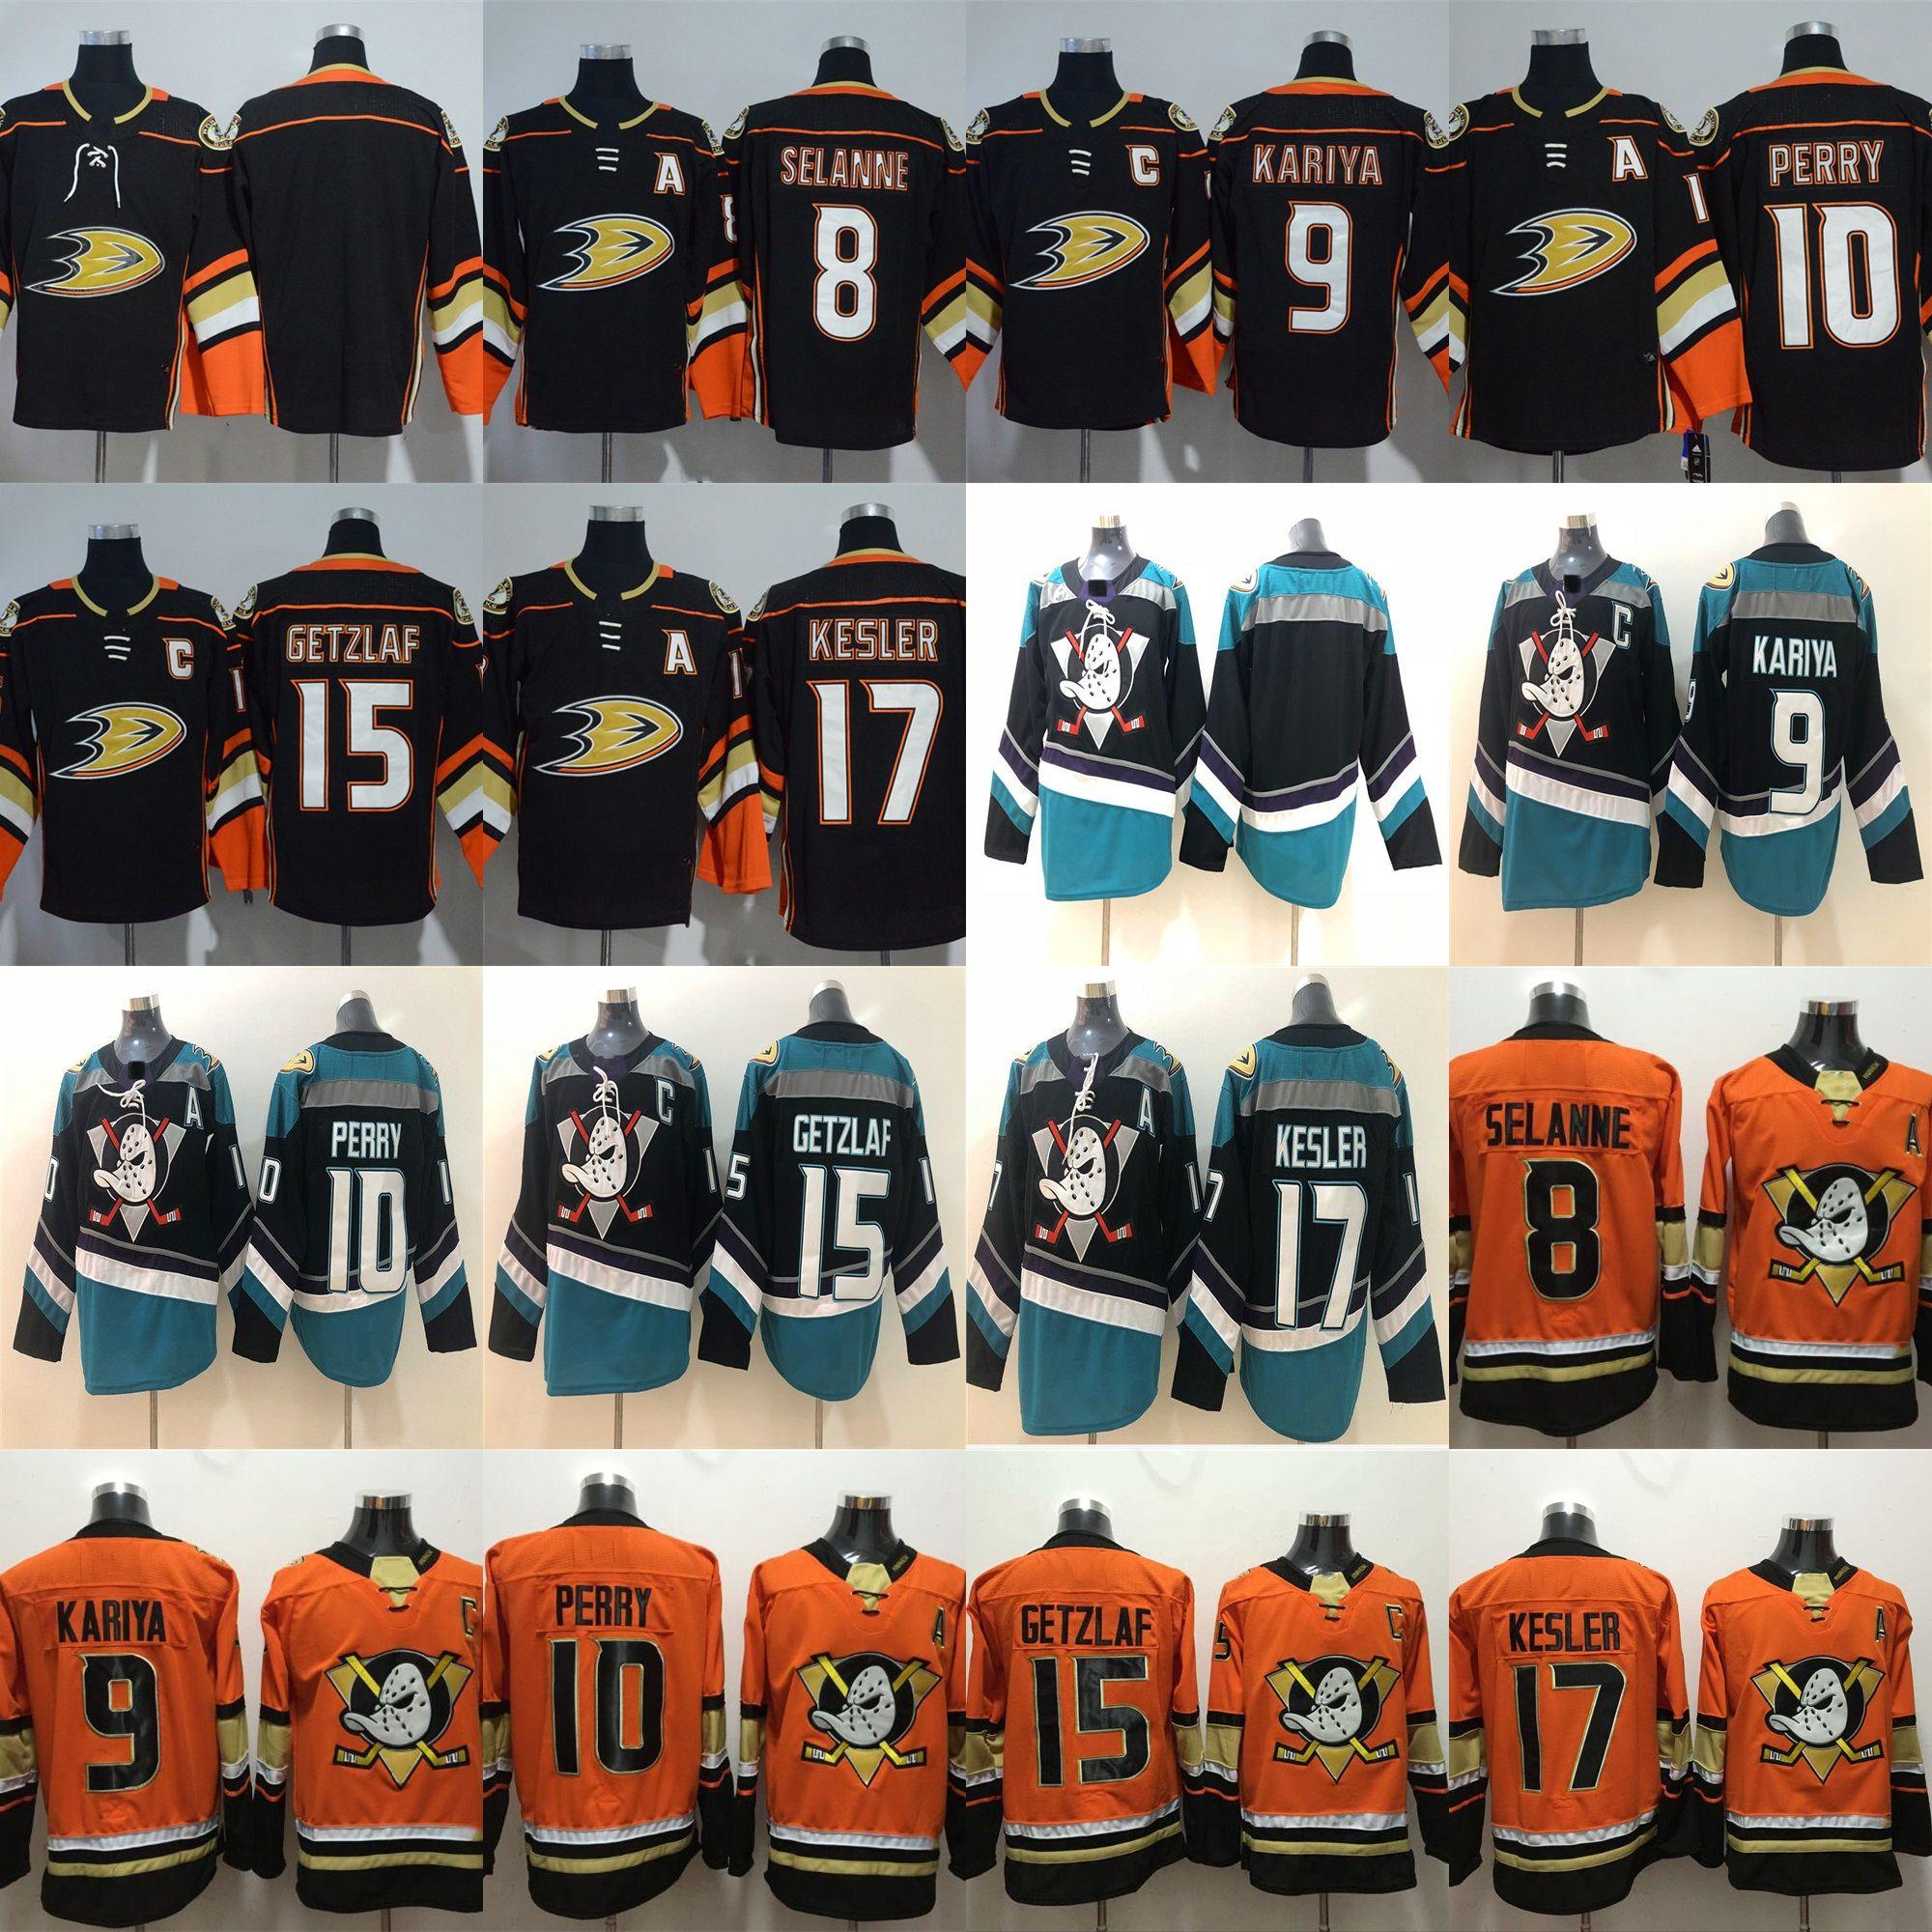 2019 Mighty Ducks Anaheim Hockey Jersey 9 Paul Kariya 8 Teemu Selanne 10  Corey Perry Ryan Getzlaf 17 Ryan Kesler Blank Anaheim Ducks Jerseys From  Probowl 77119a6ab